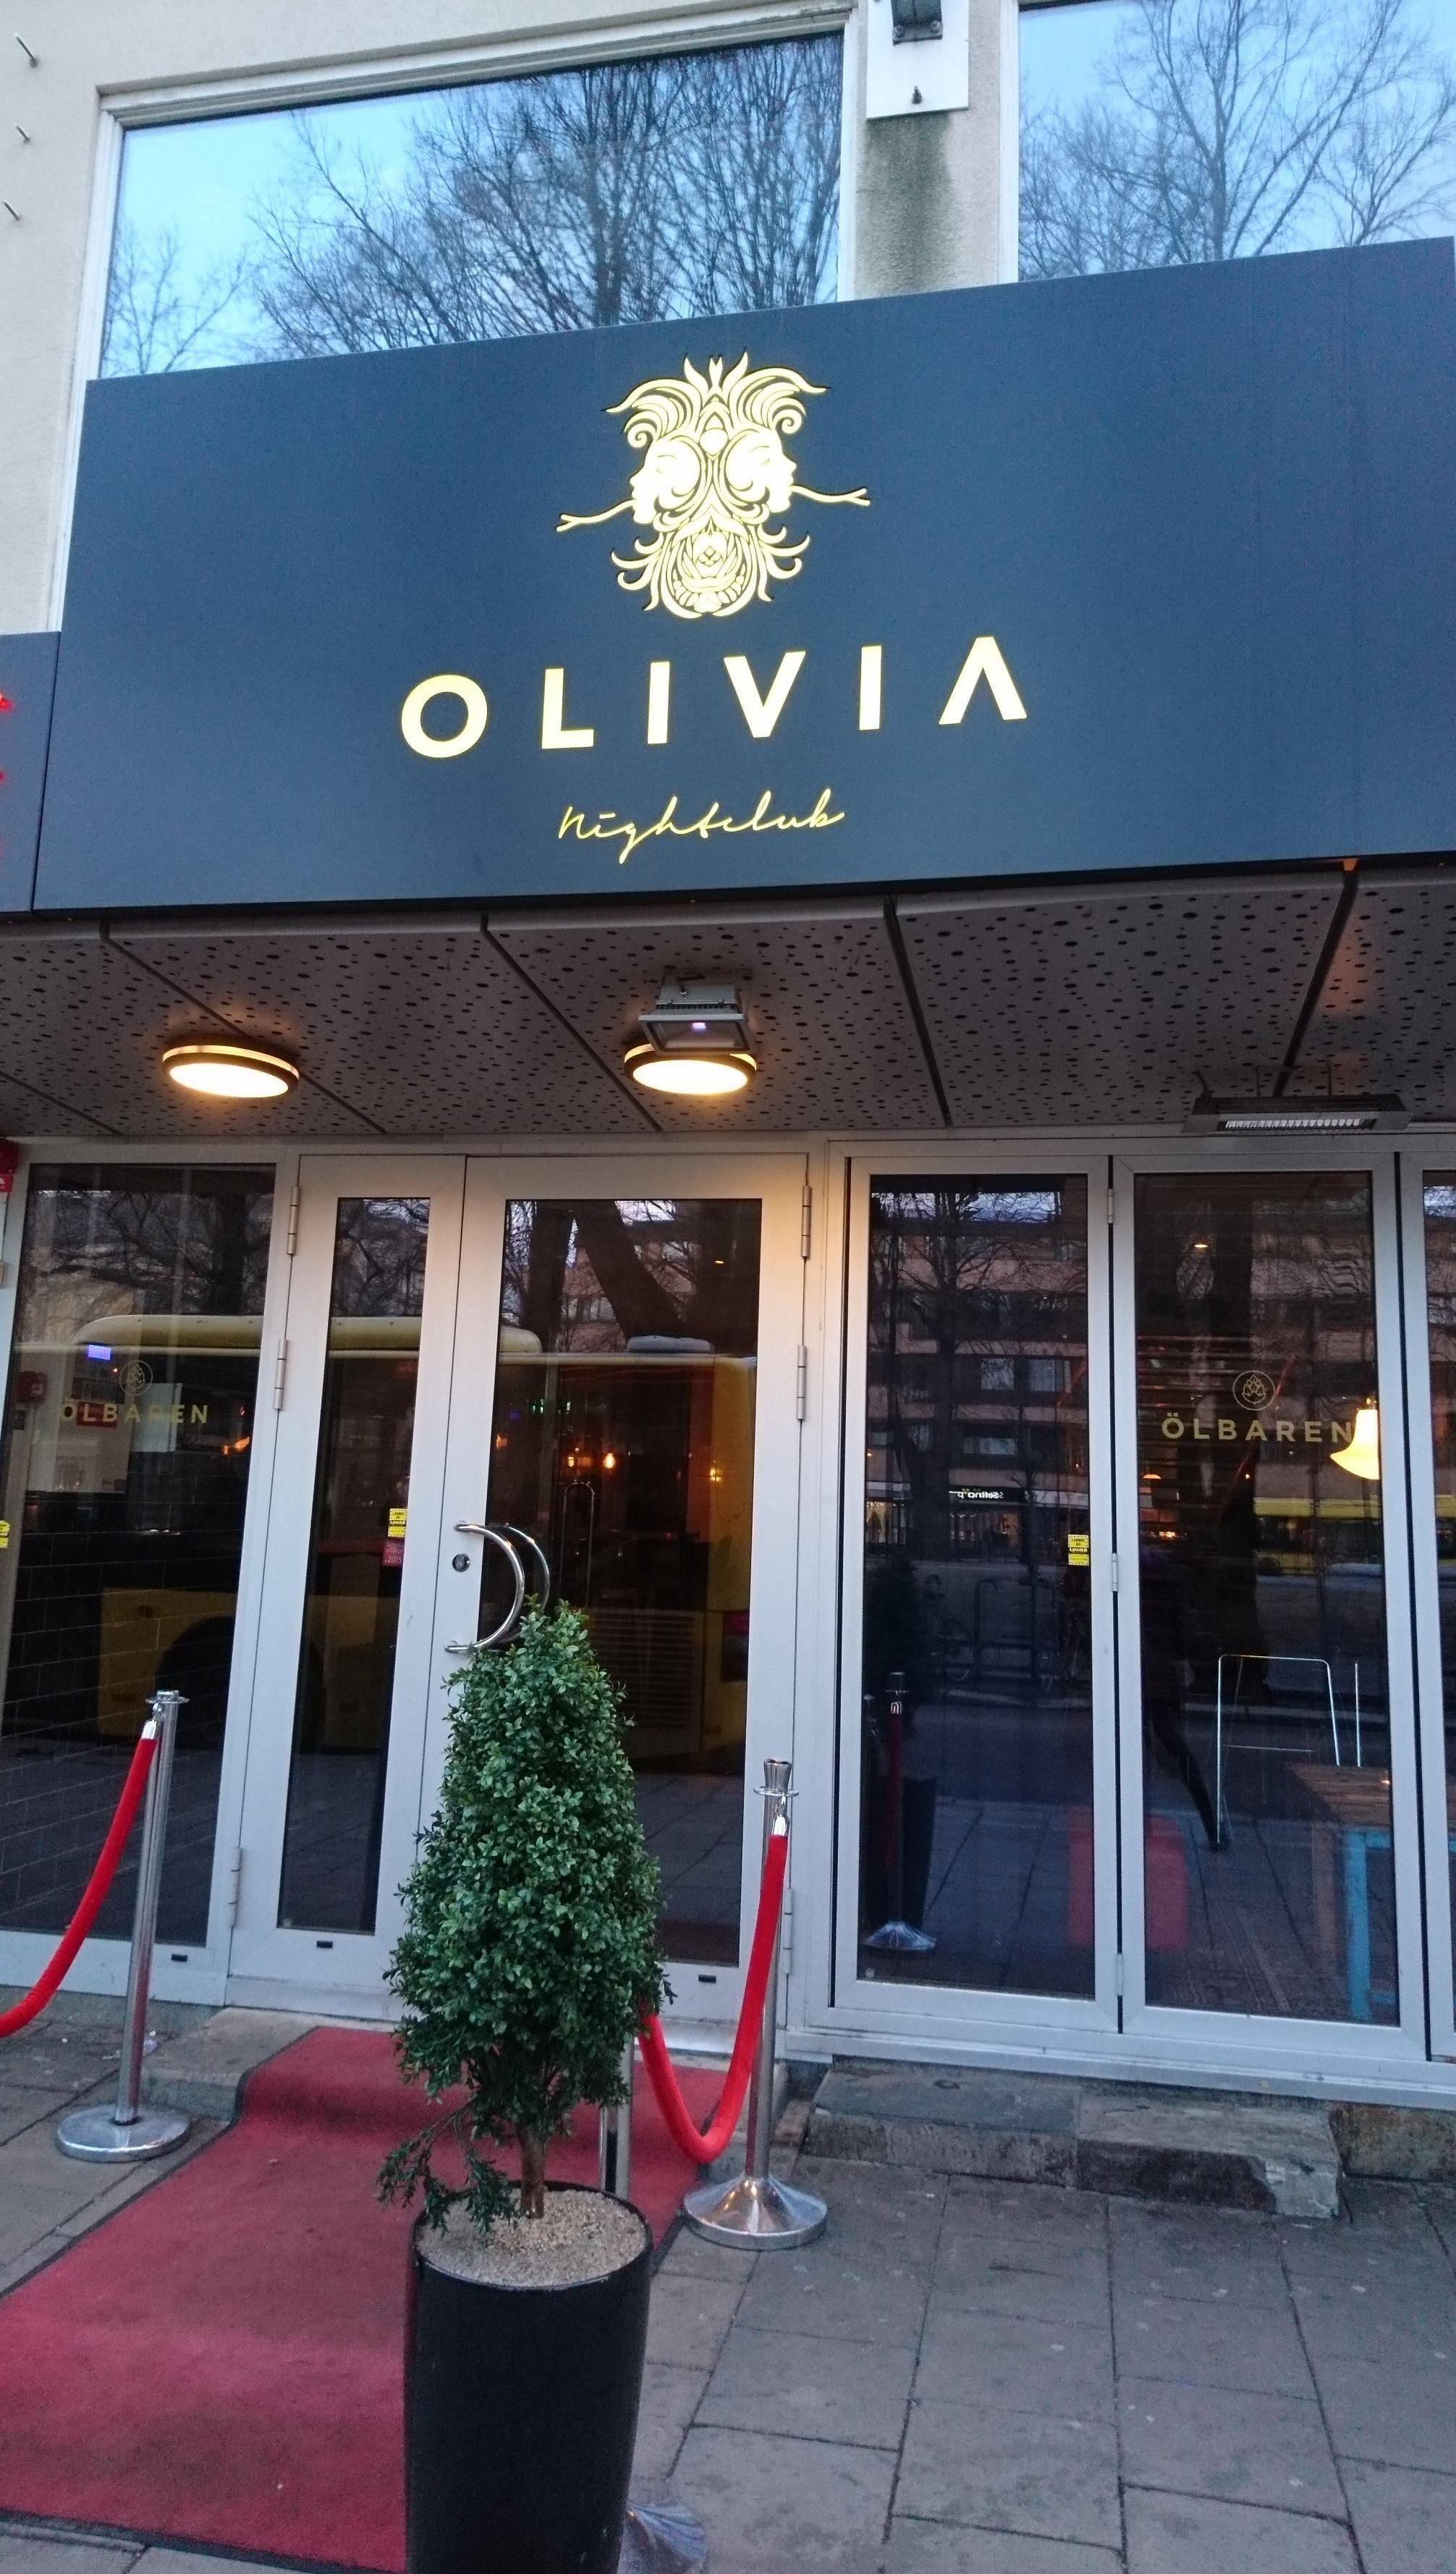 Olivia - Nattklubb